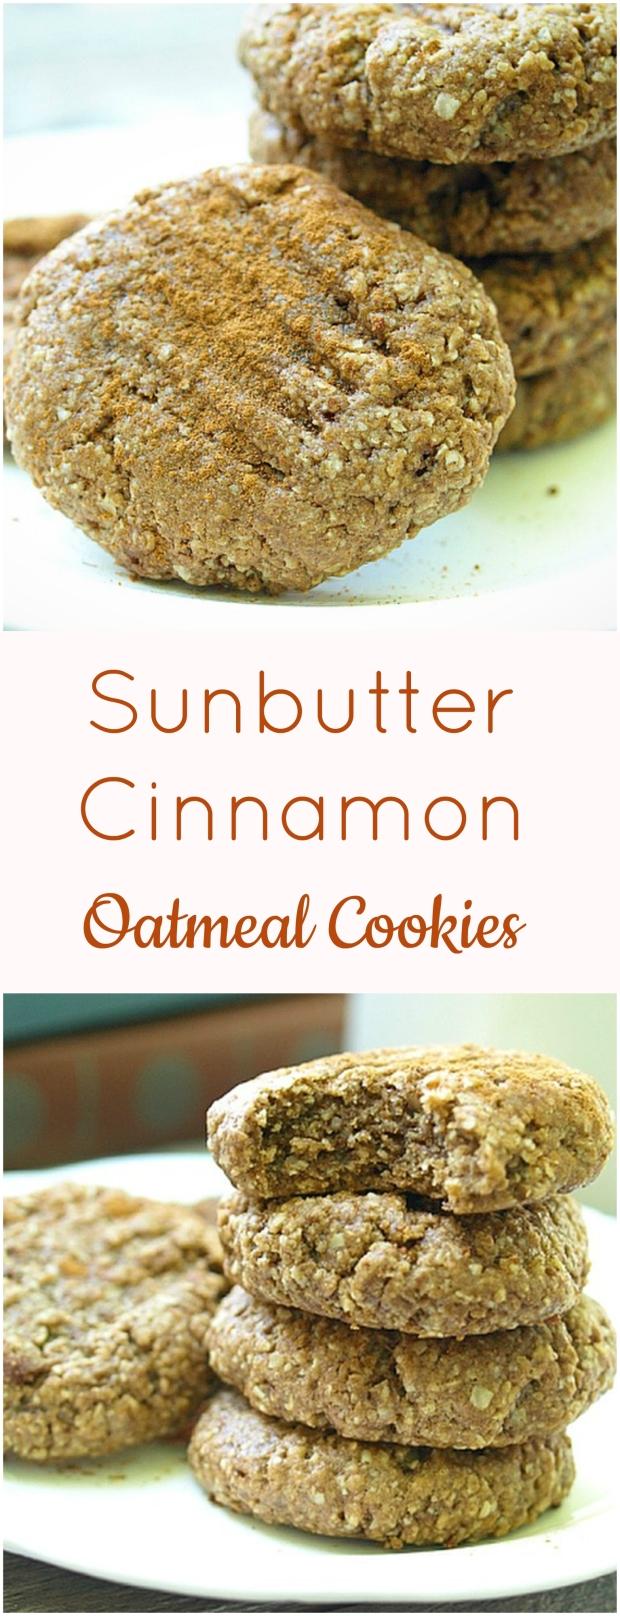 Sunbutter Cinnamon Oatmeal Cookies - Vegan, Gluten Free, Nut Free